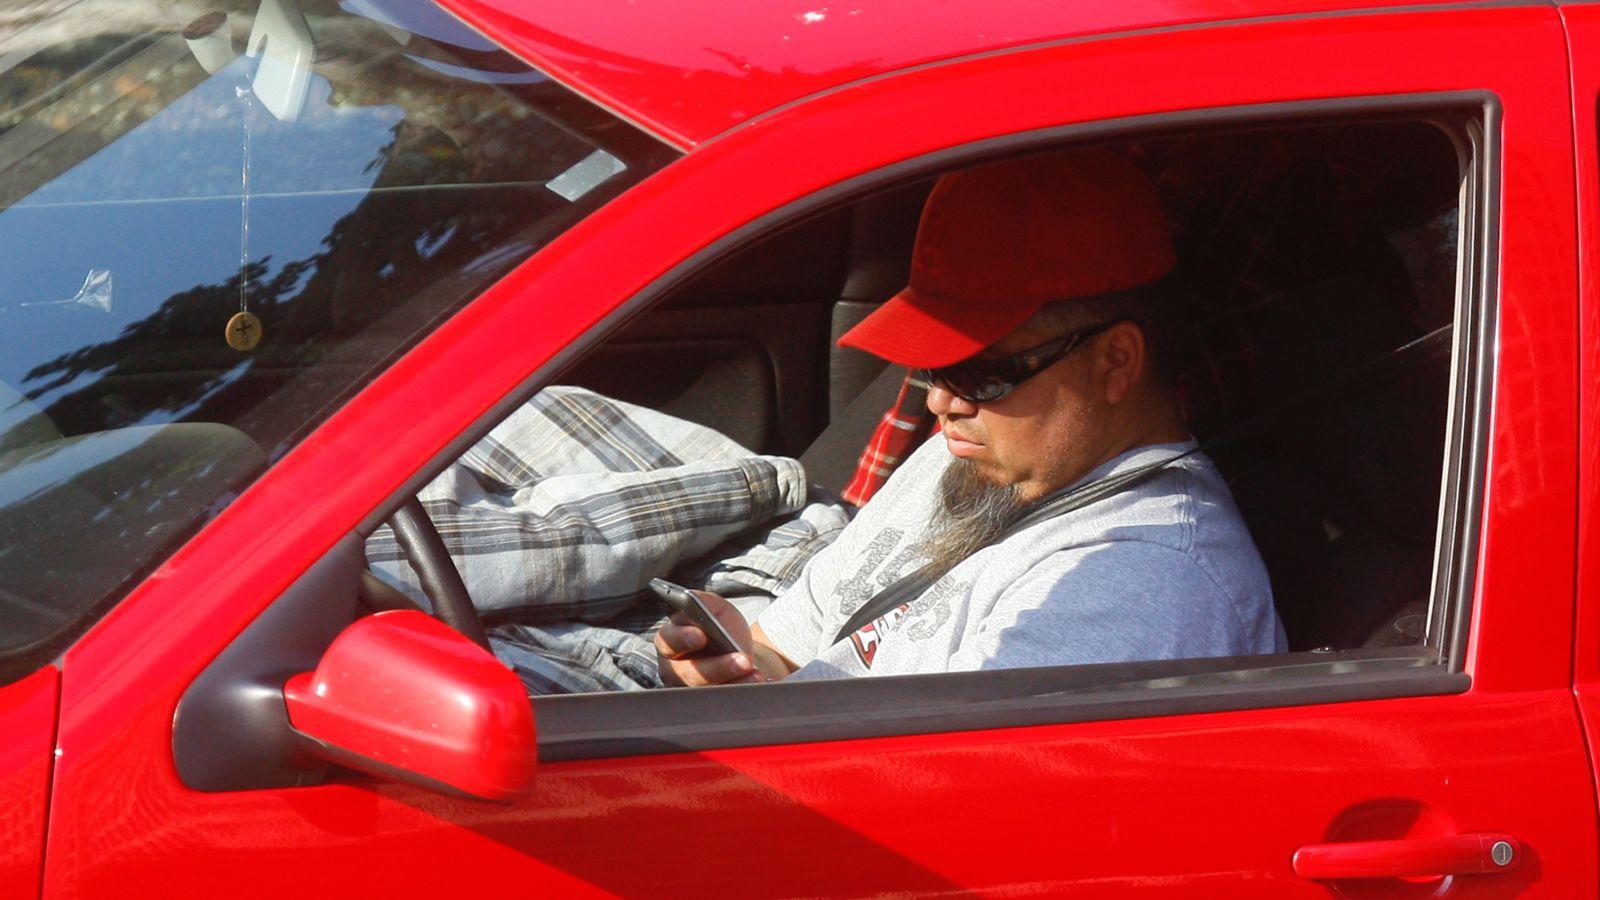 smartphone, pedestrians, distracted driving